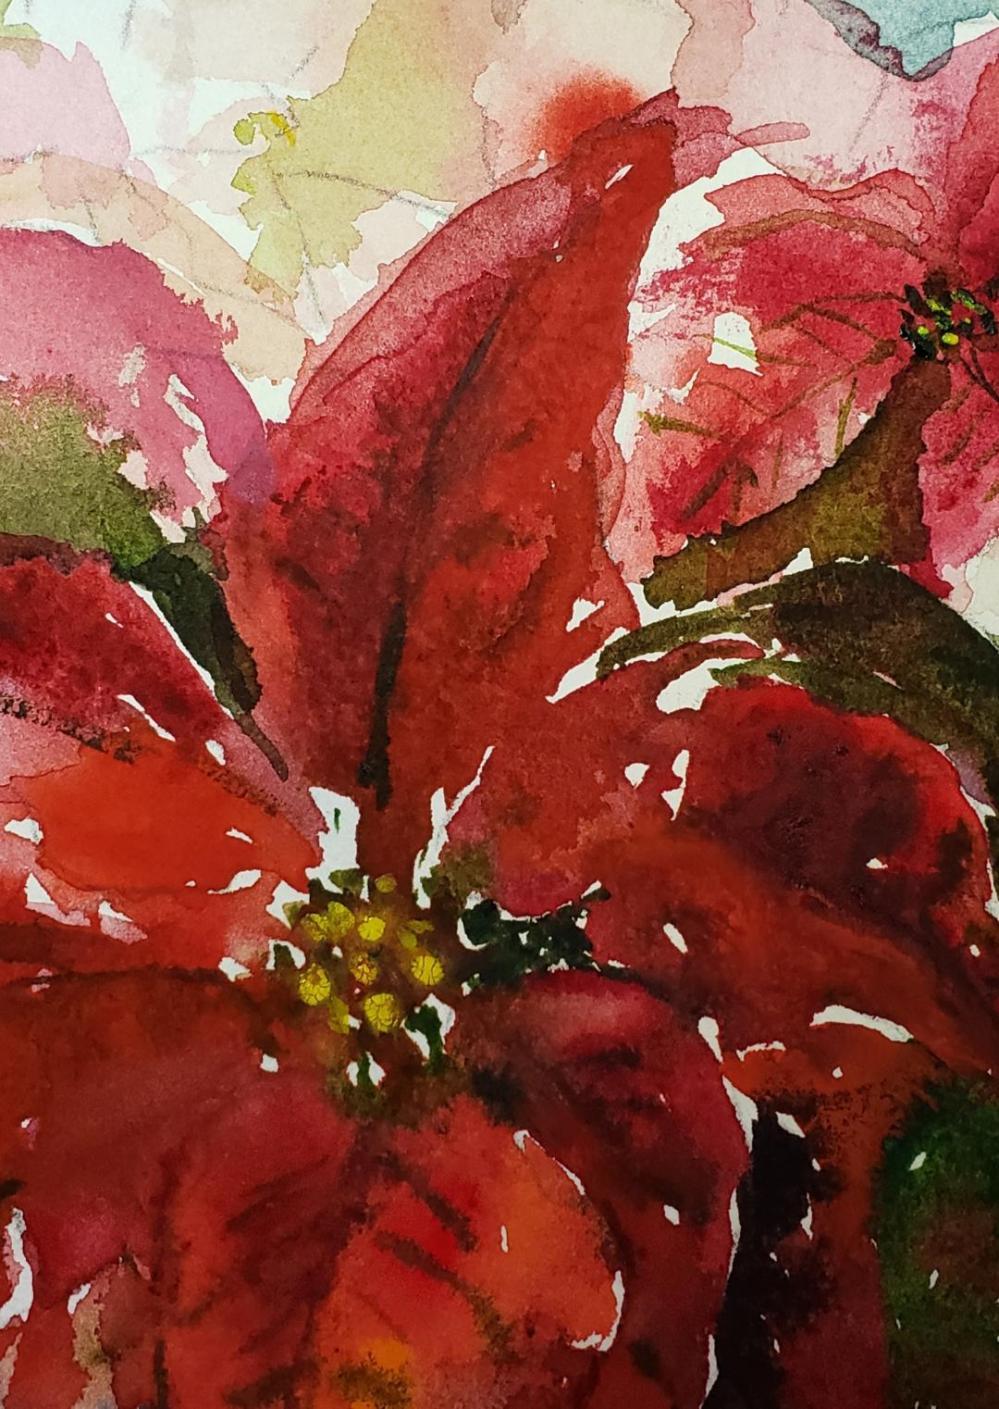 Brenda Painting_Dec 2019 Prec message